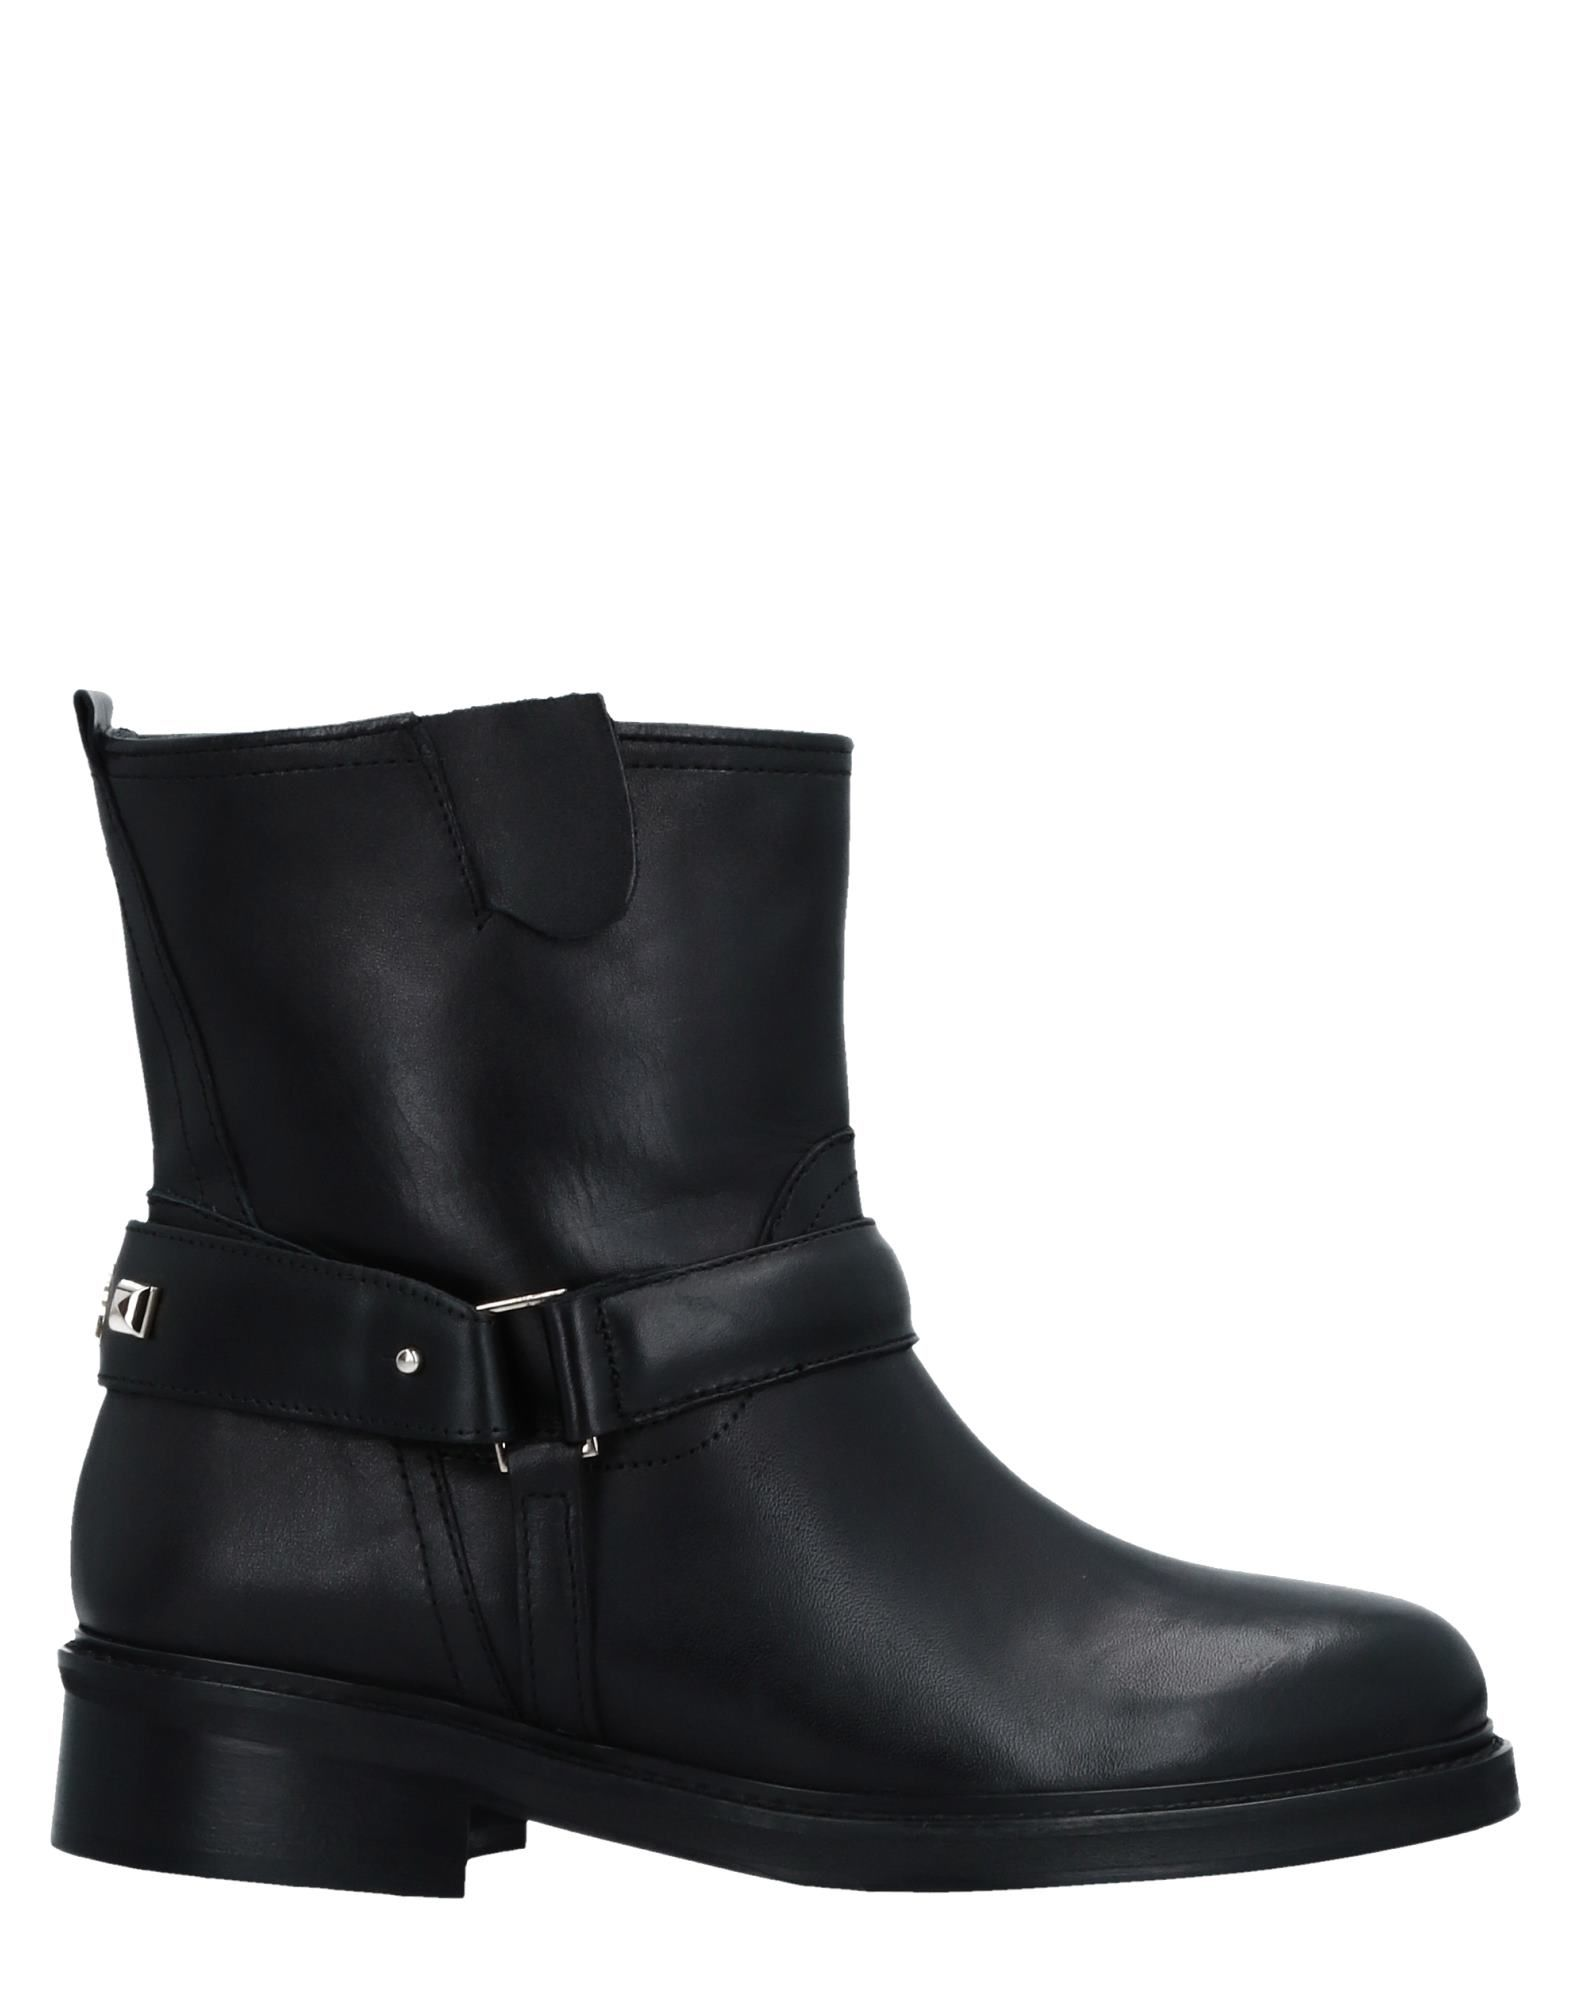 Patrizia Pepe Stiefelette Damen  11519515DPGut aussehende strapazierfähige Schuhe